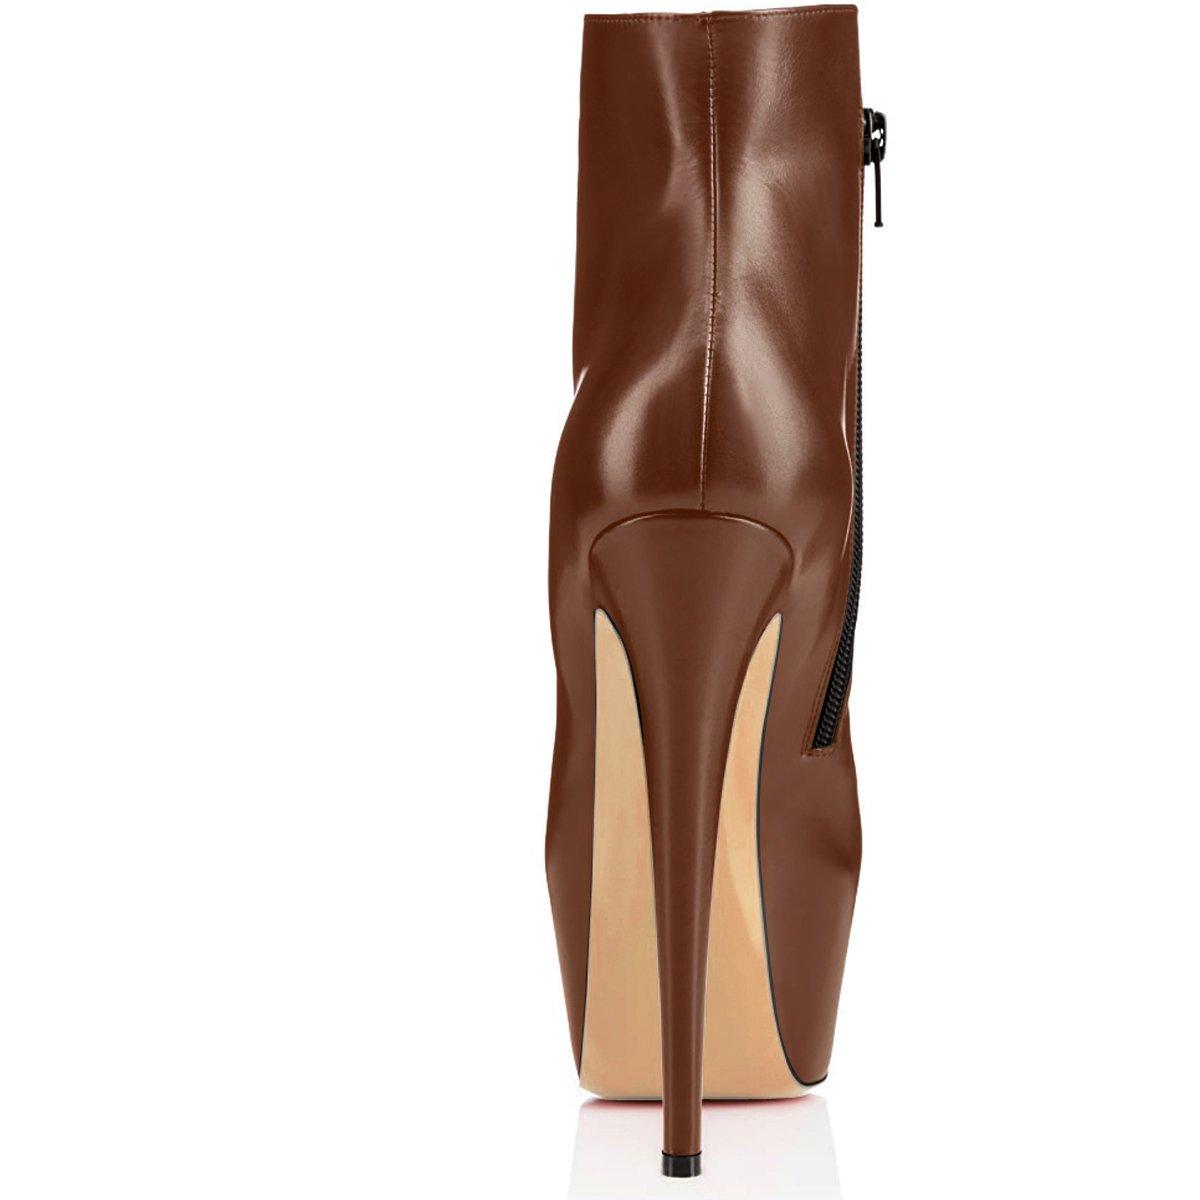 EDEFS - - - Scarpe da Donna - Tacco a Spillo - Stivali donna - Zip Stivaletti Donna e28700